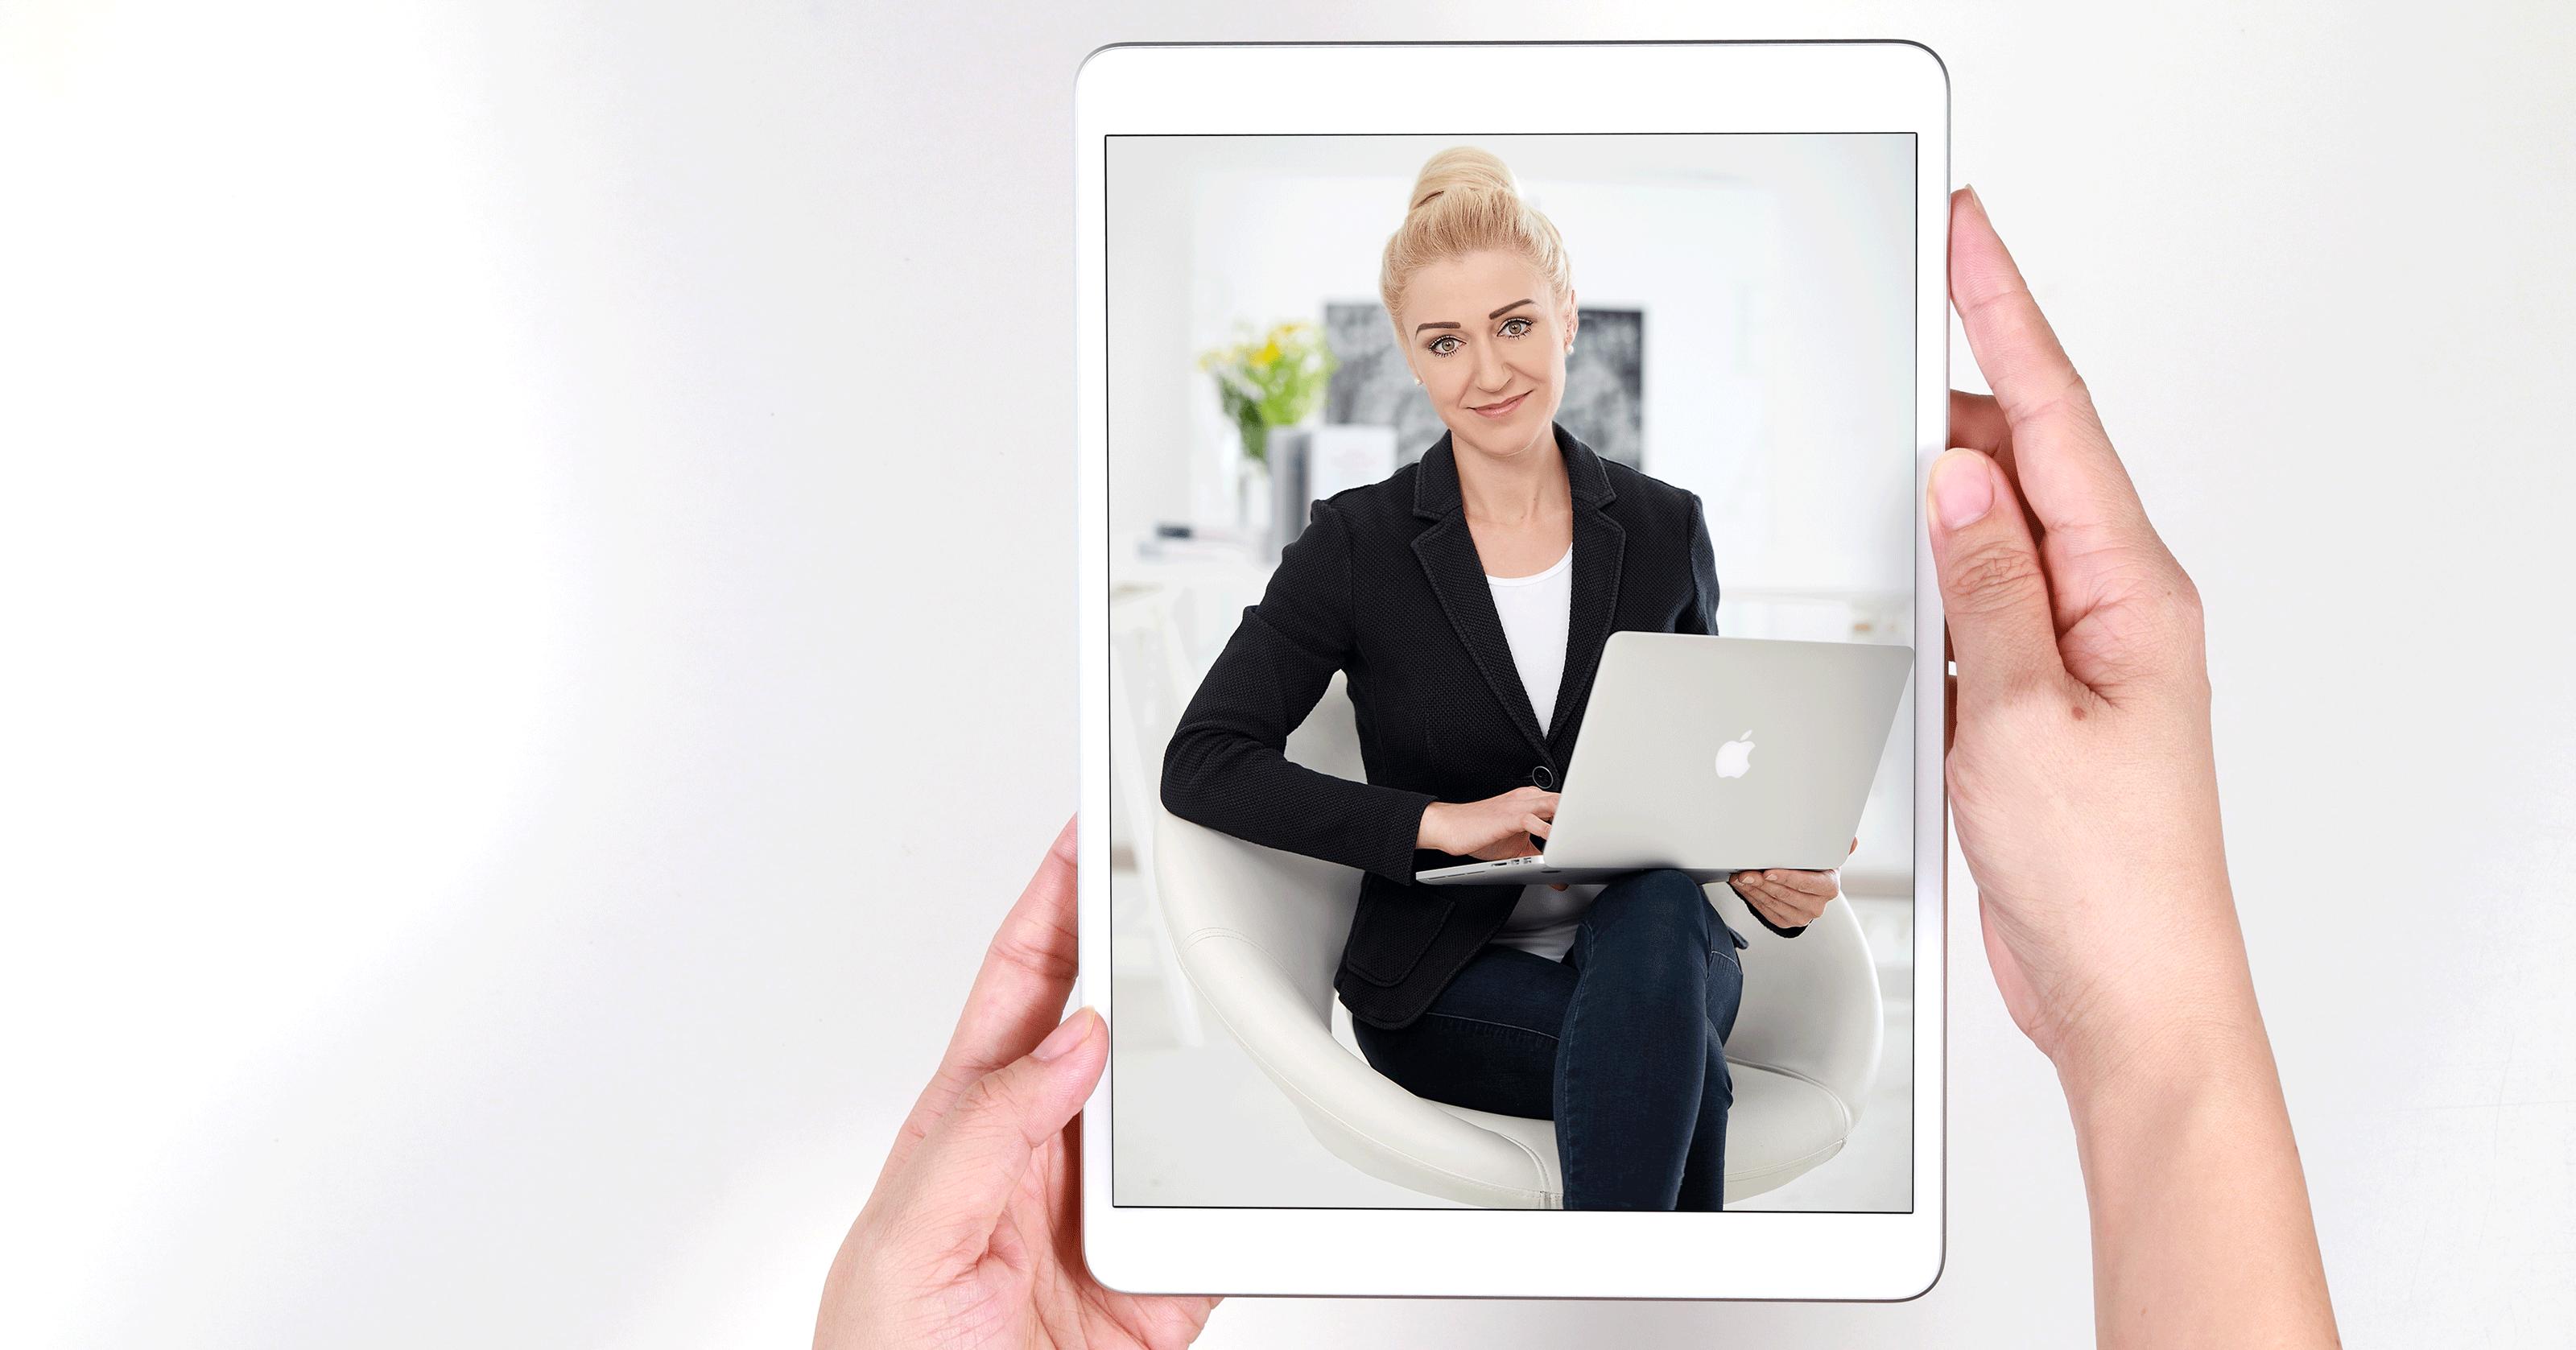 COVID-19 Corona Krise Psychotherapie Videotelefonie Zoom Skype Signal Facetime Heidi Steinberger-Daveid Online-Therapie